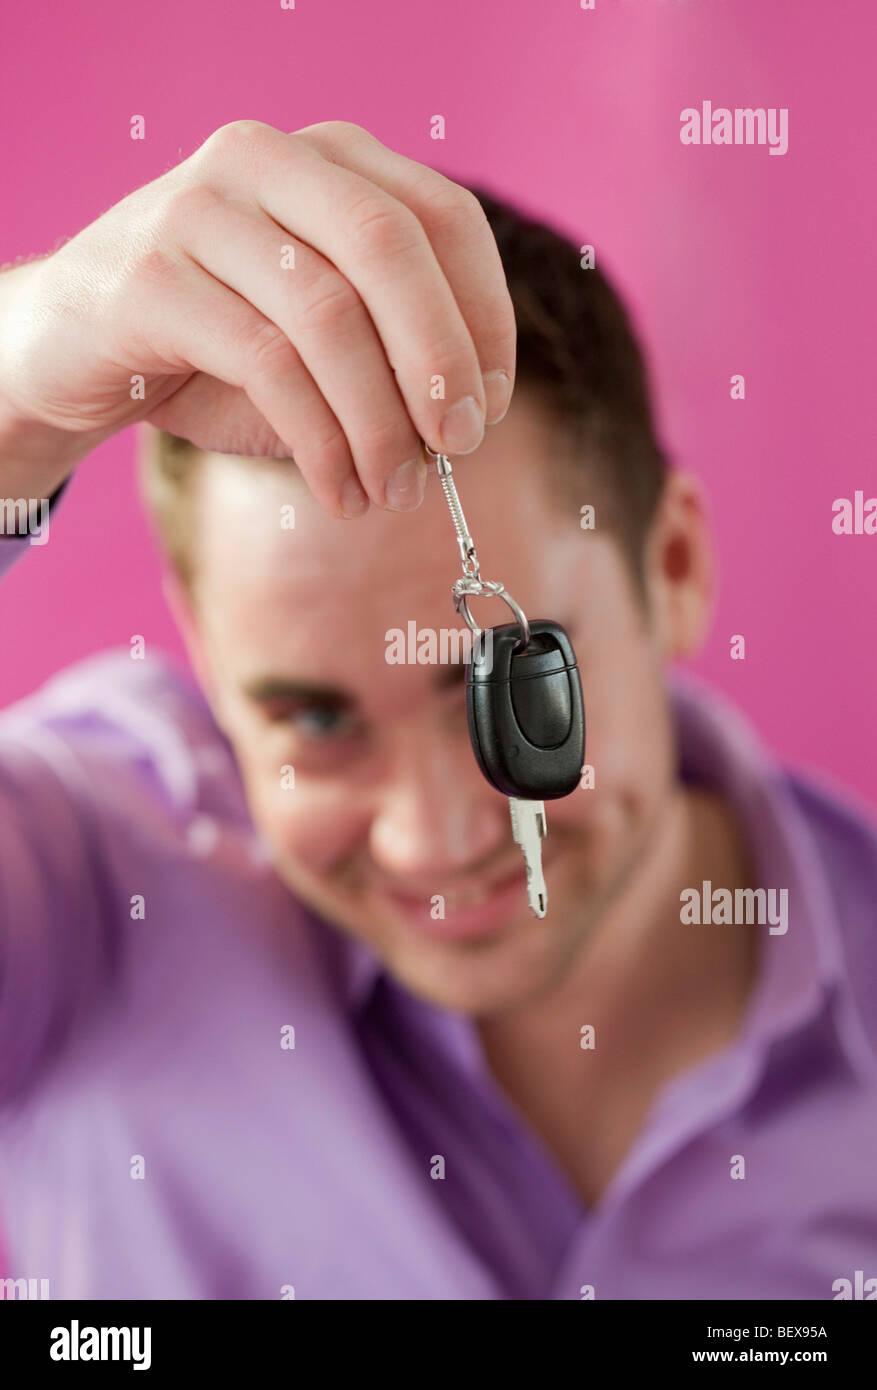 Junger Mann hält einen Autoschlüssel. Stockbild